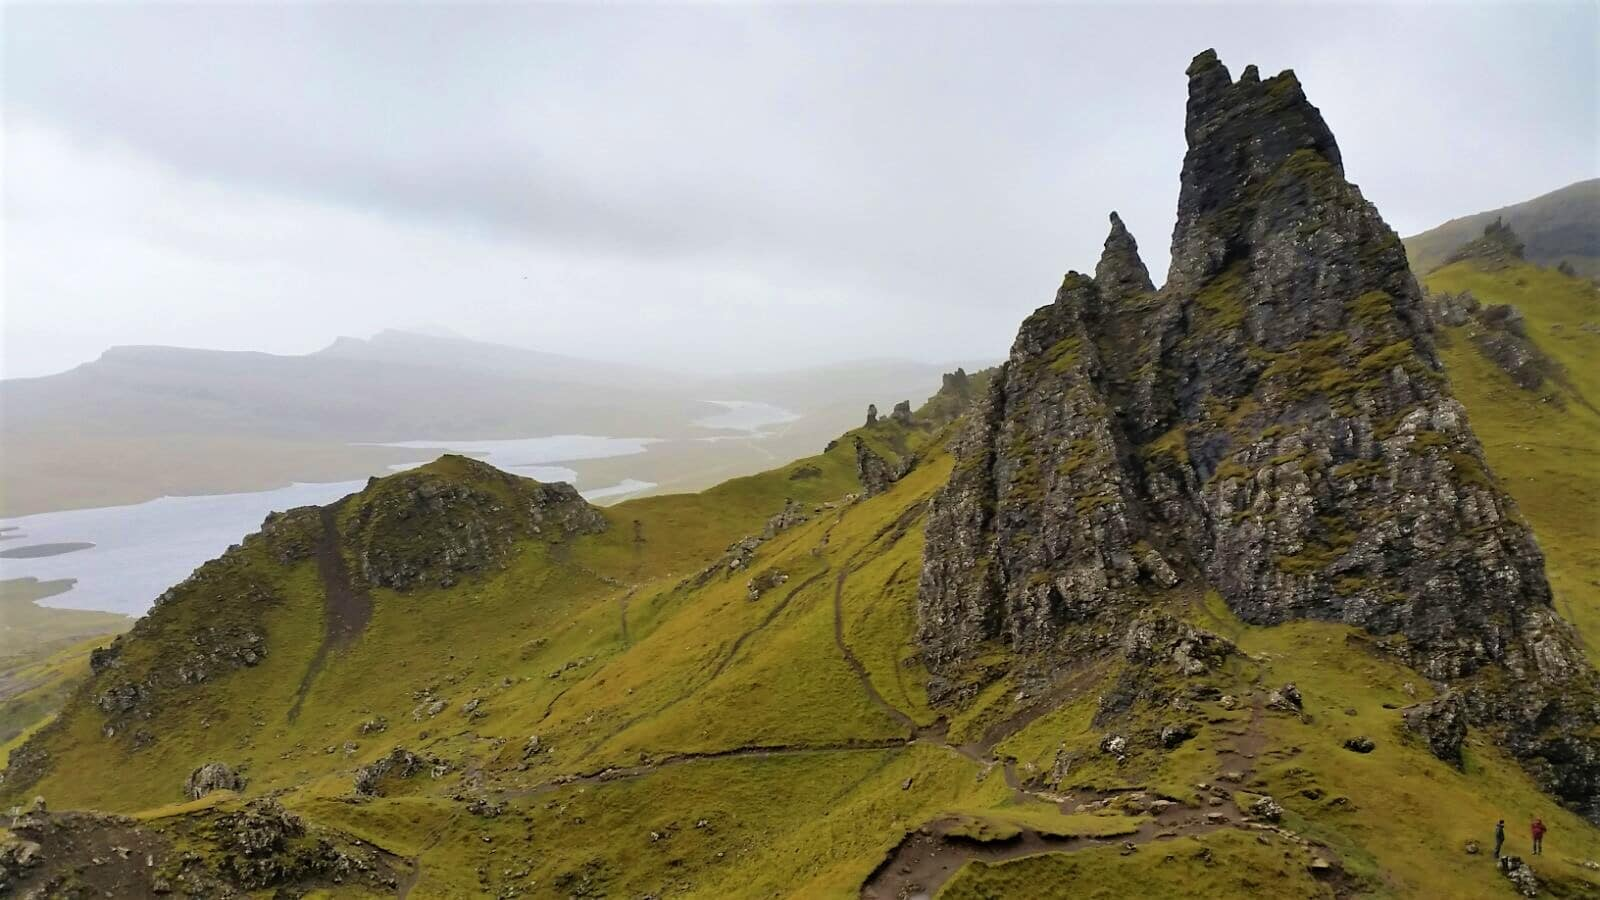 L'île de skye, Old Man of Storr